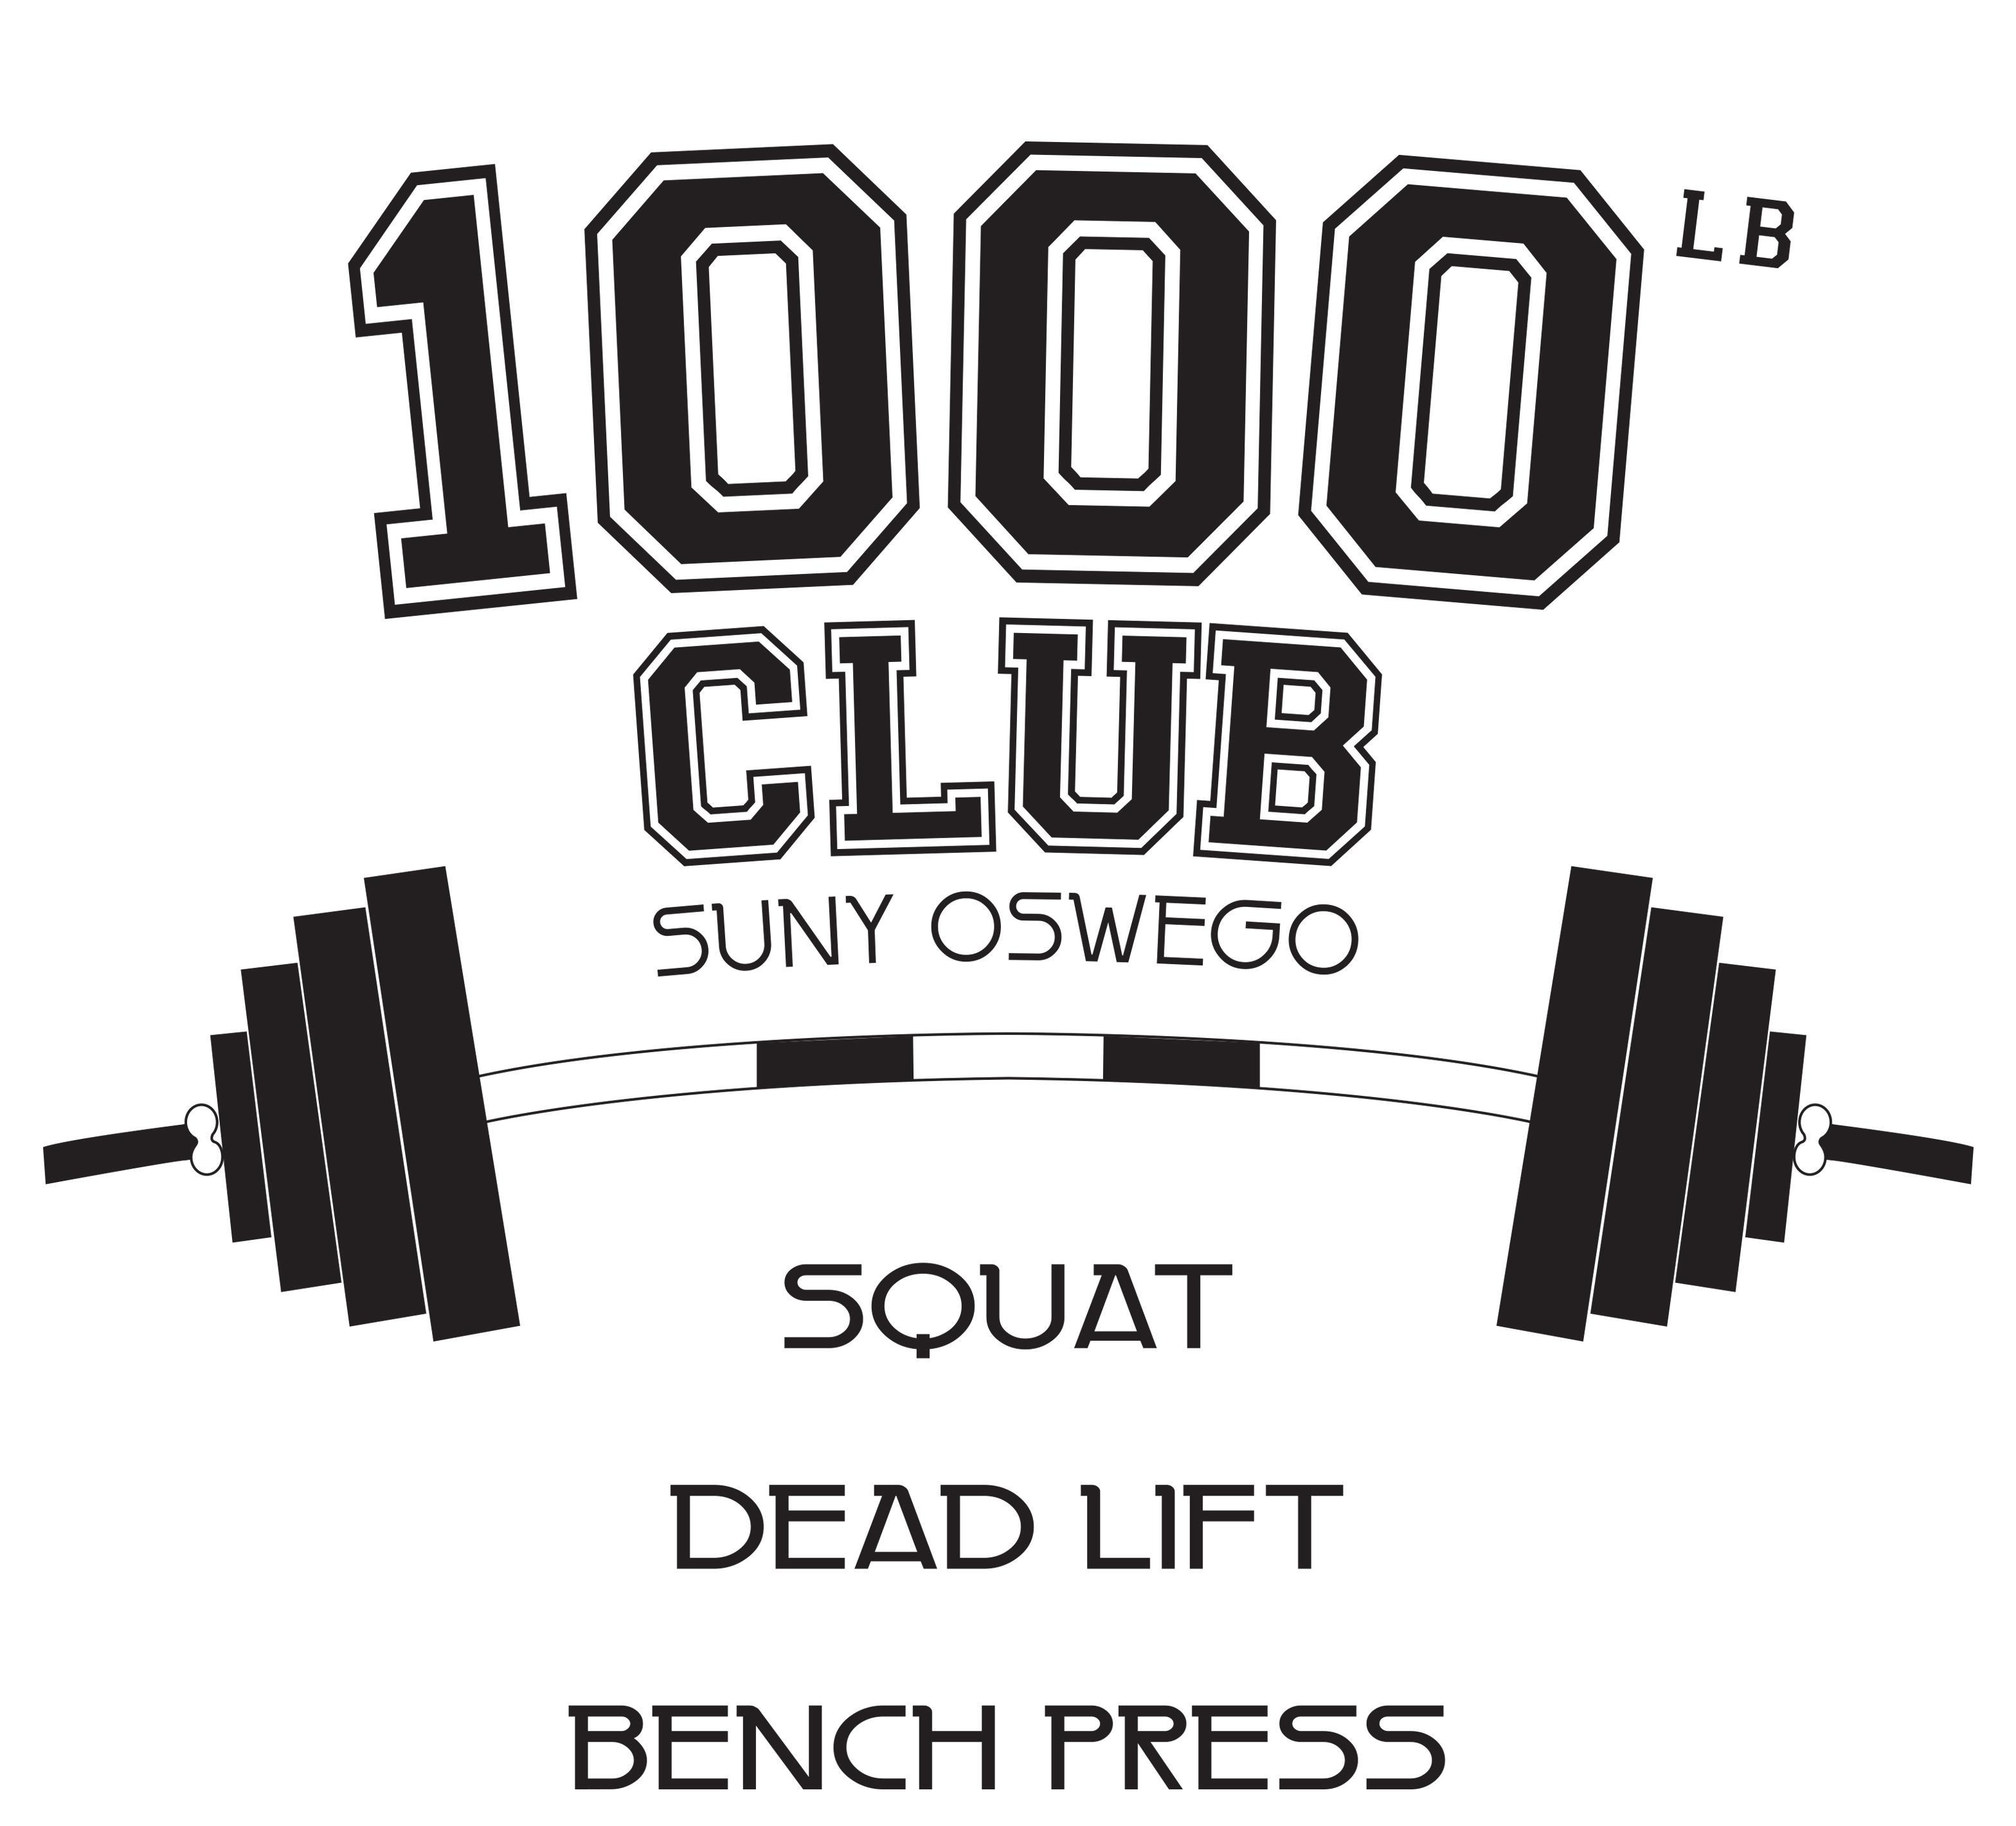 1000 lb image